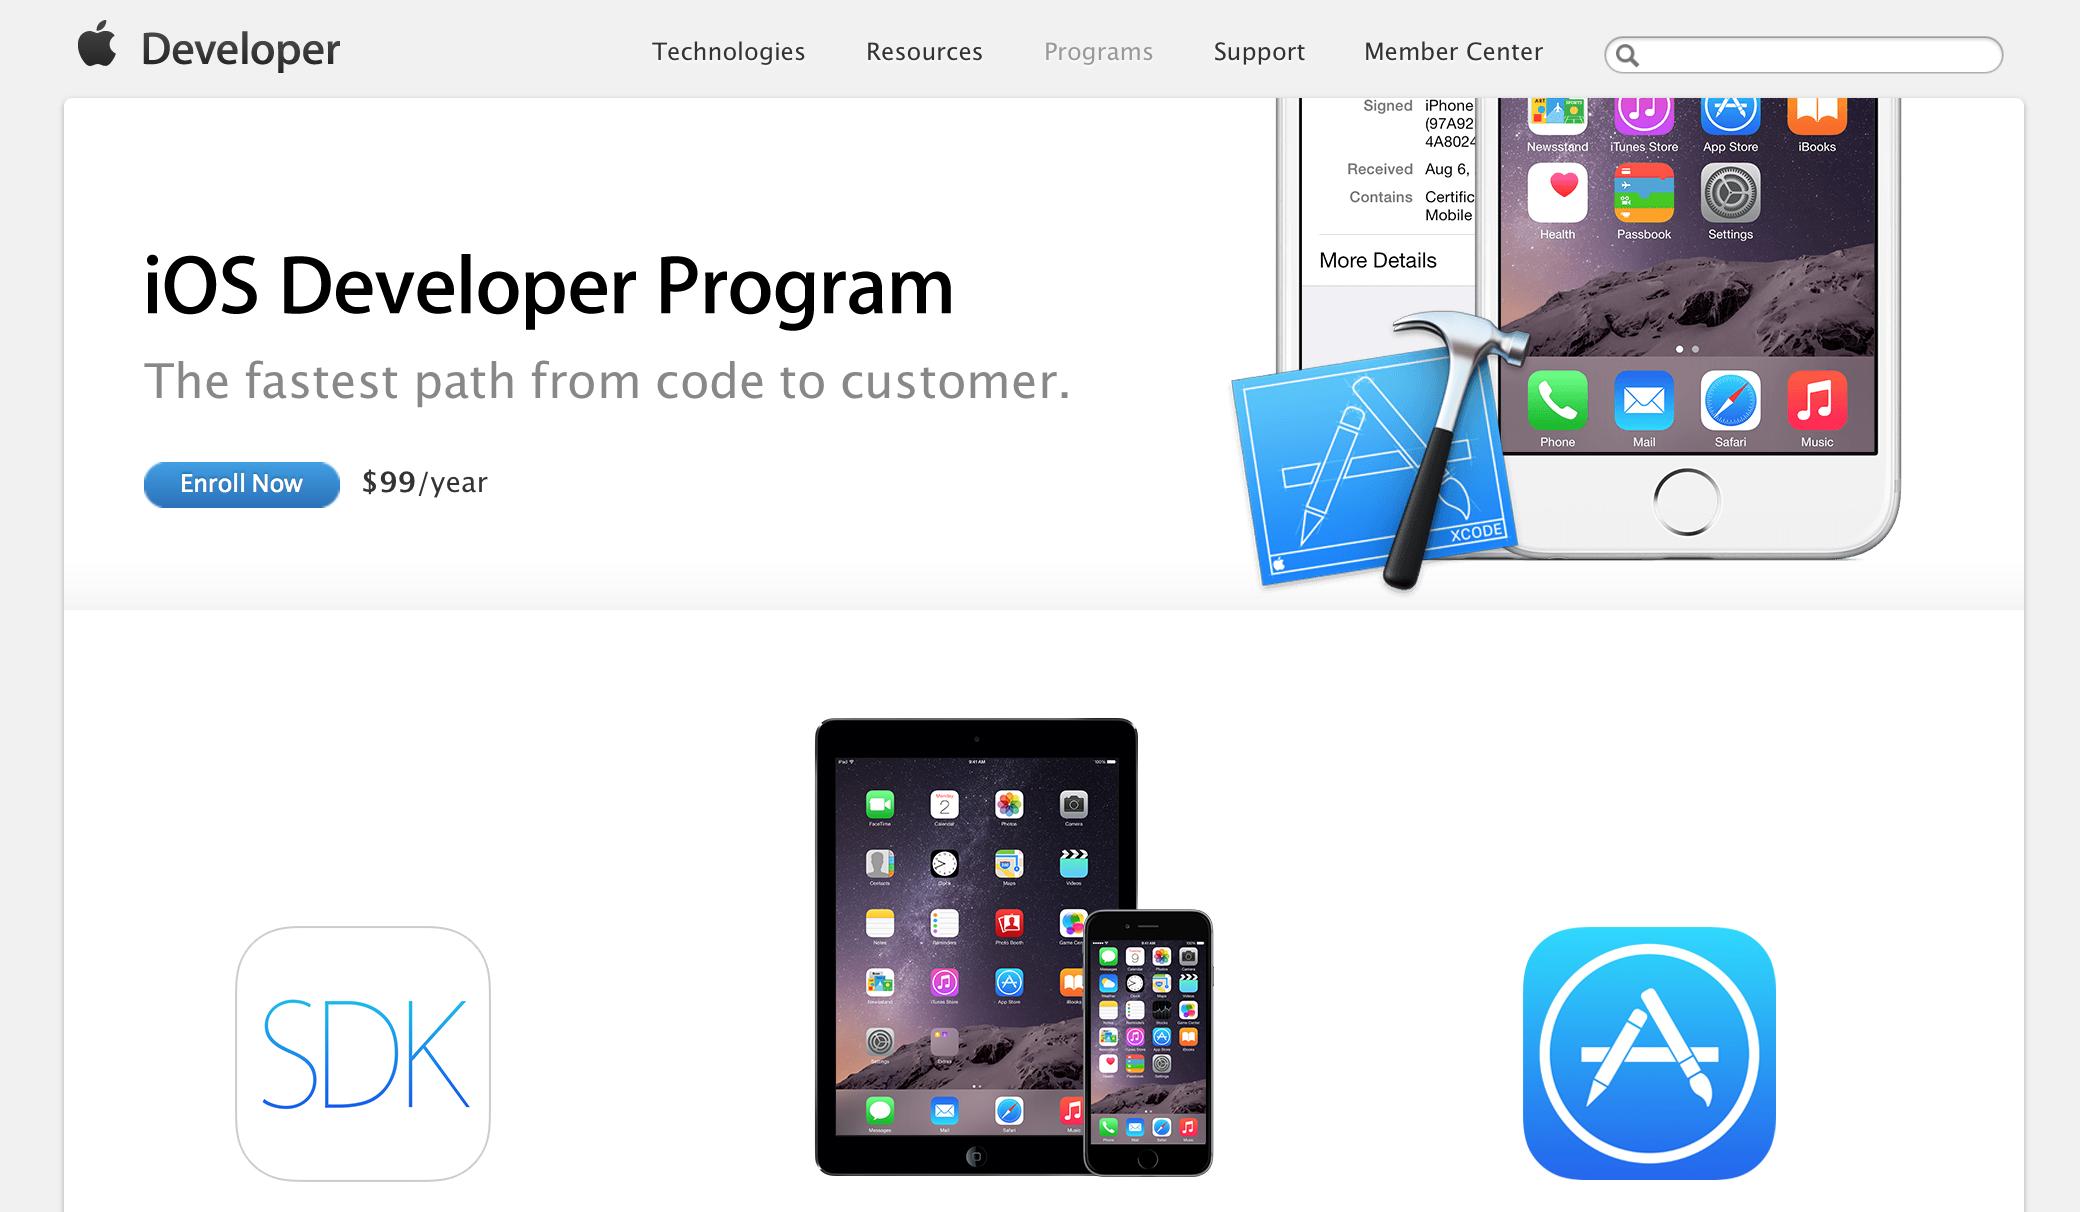 Регистрация на сайте Apple в качестве разработчика